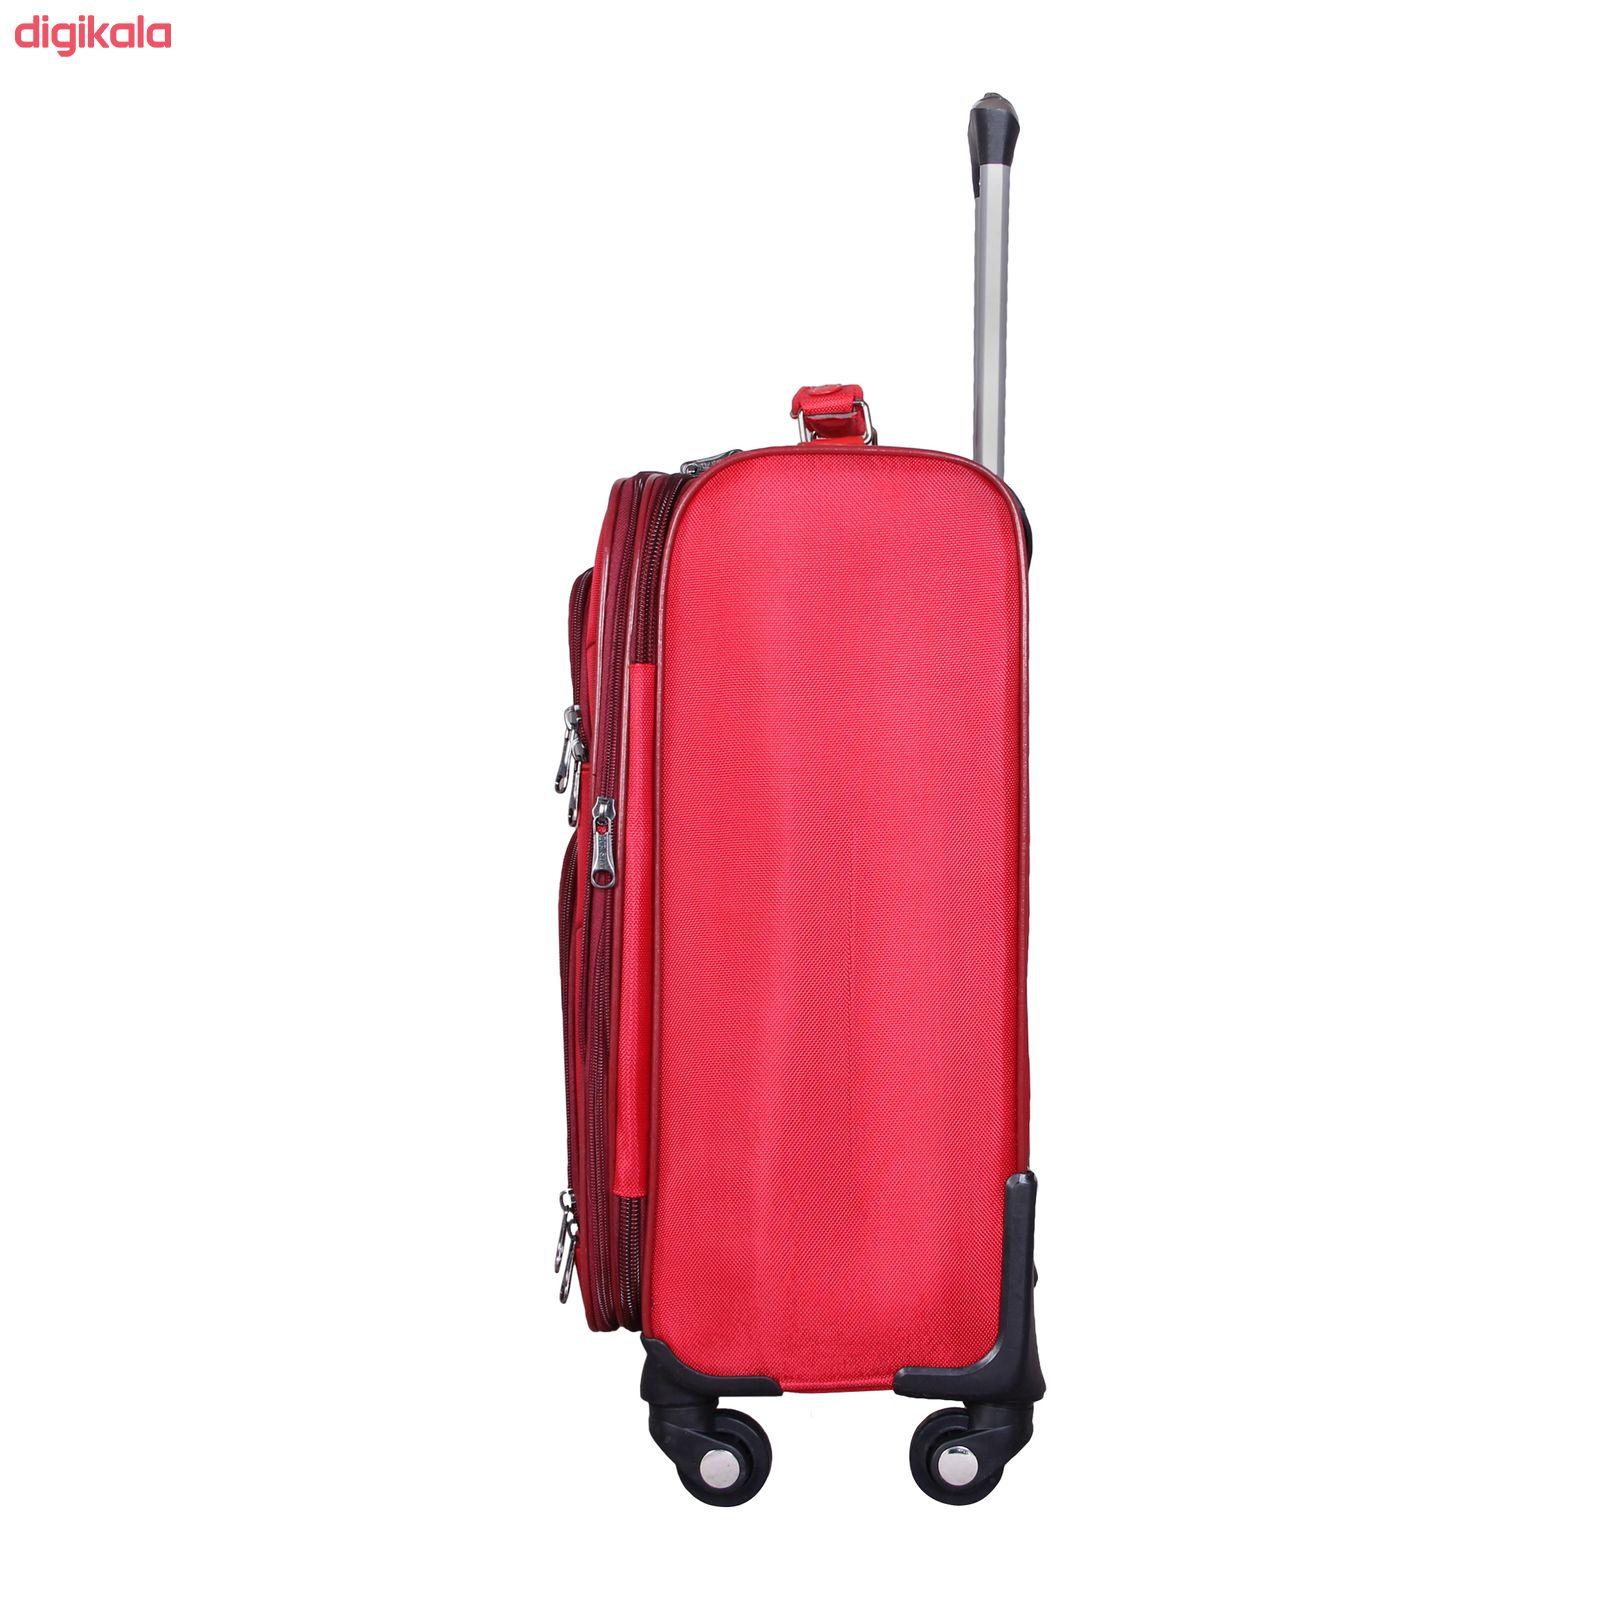 مجموعه سه عددی چمدان کدA1034 main 1 11